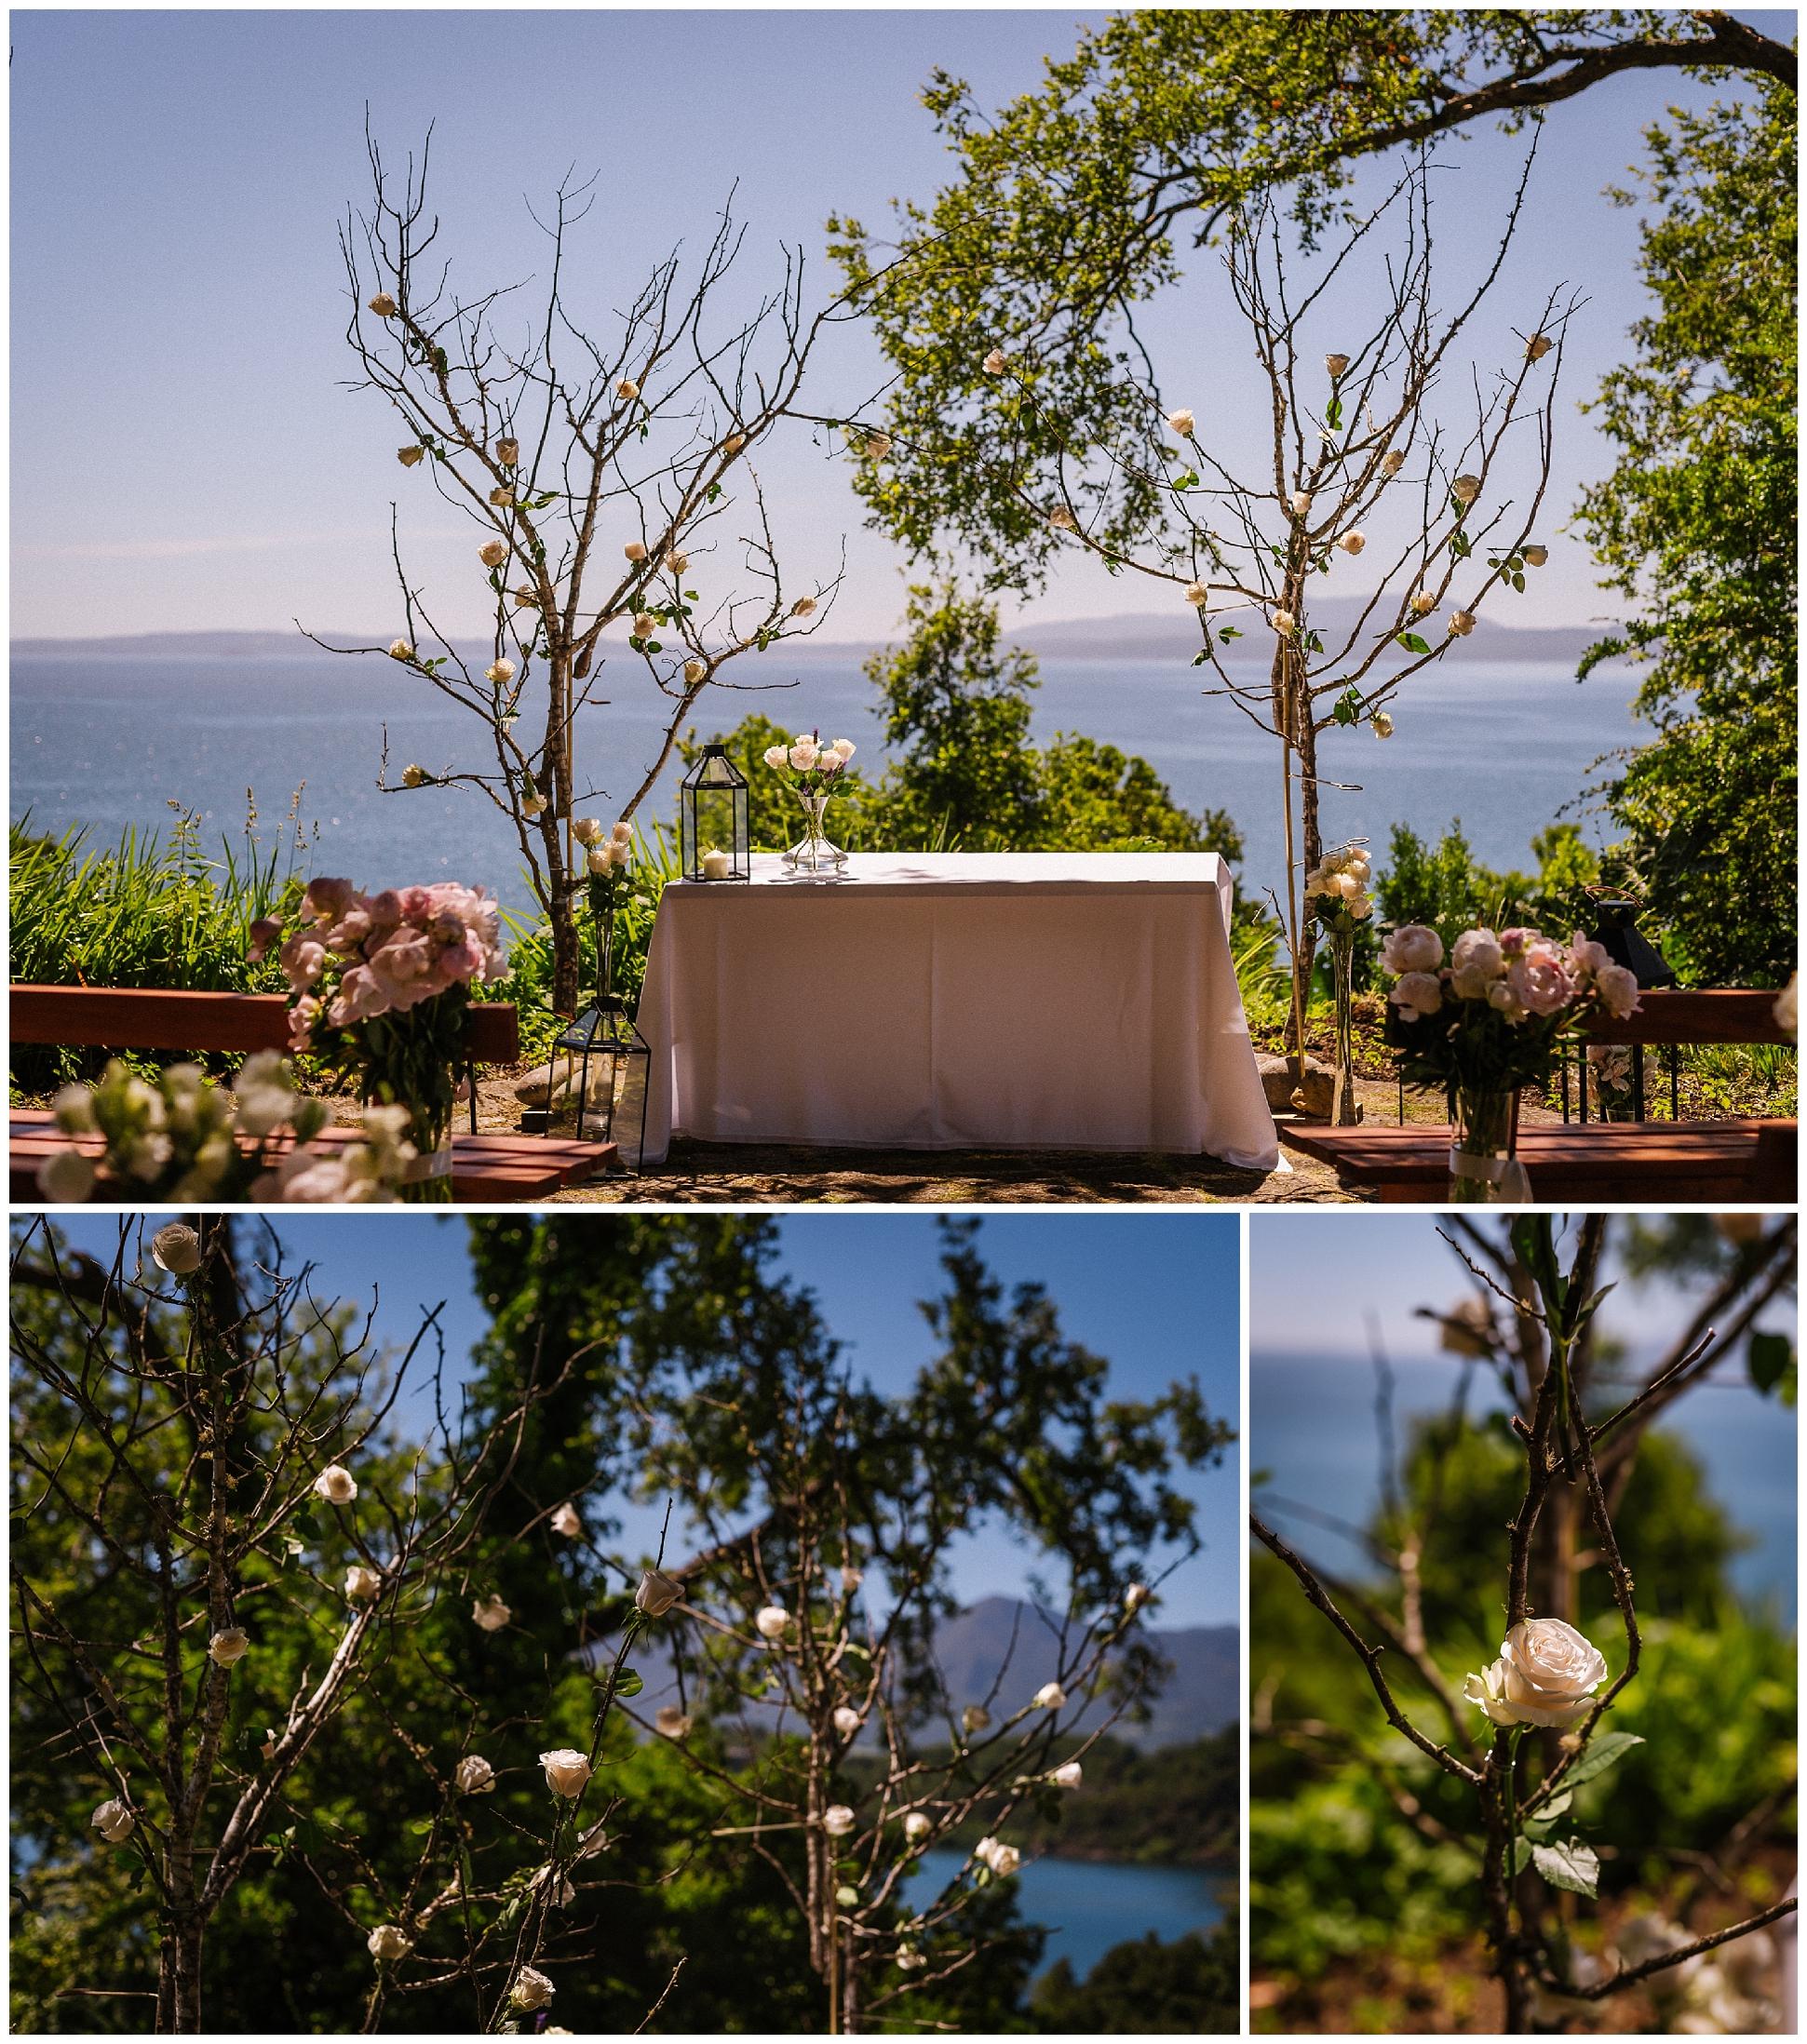 Cheilean-destination-adventure-wedding-florida-patagonia-pucon-santa-cruz-vsco_0067.jpg